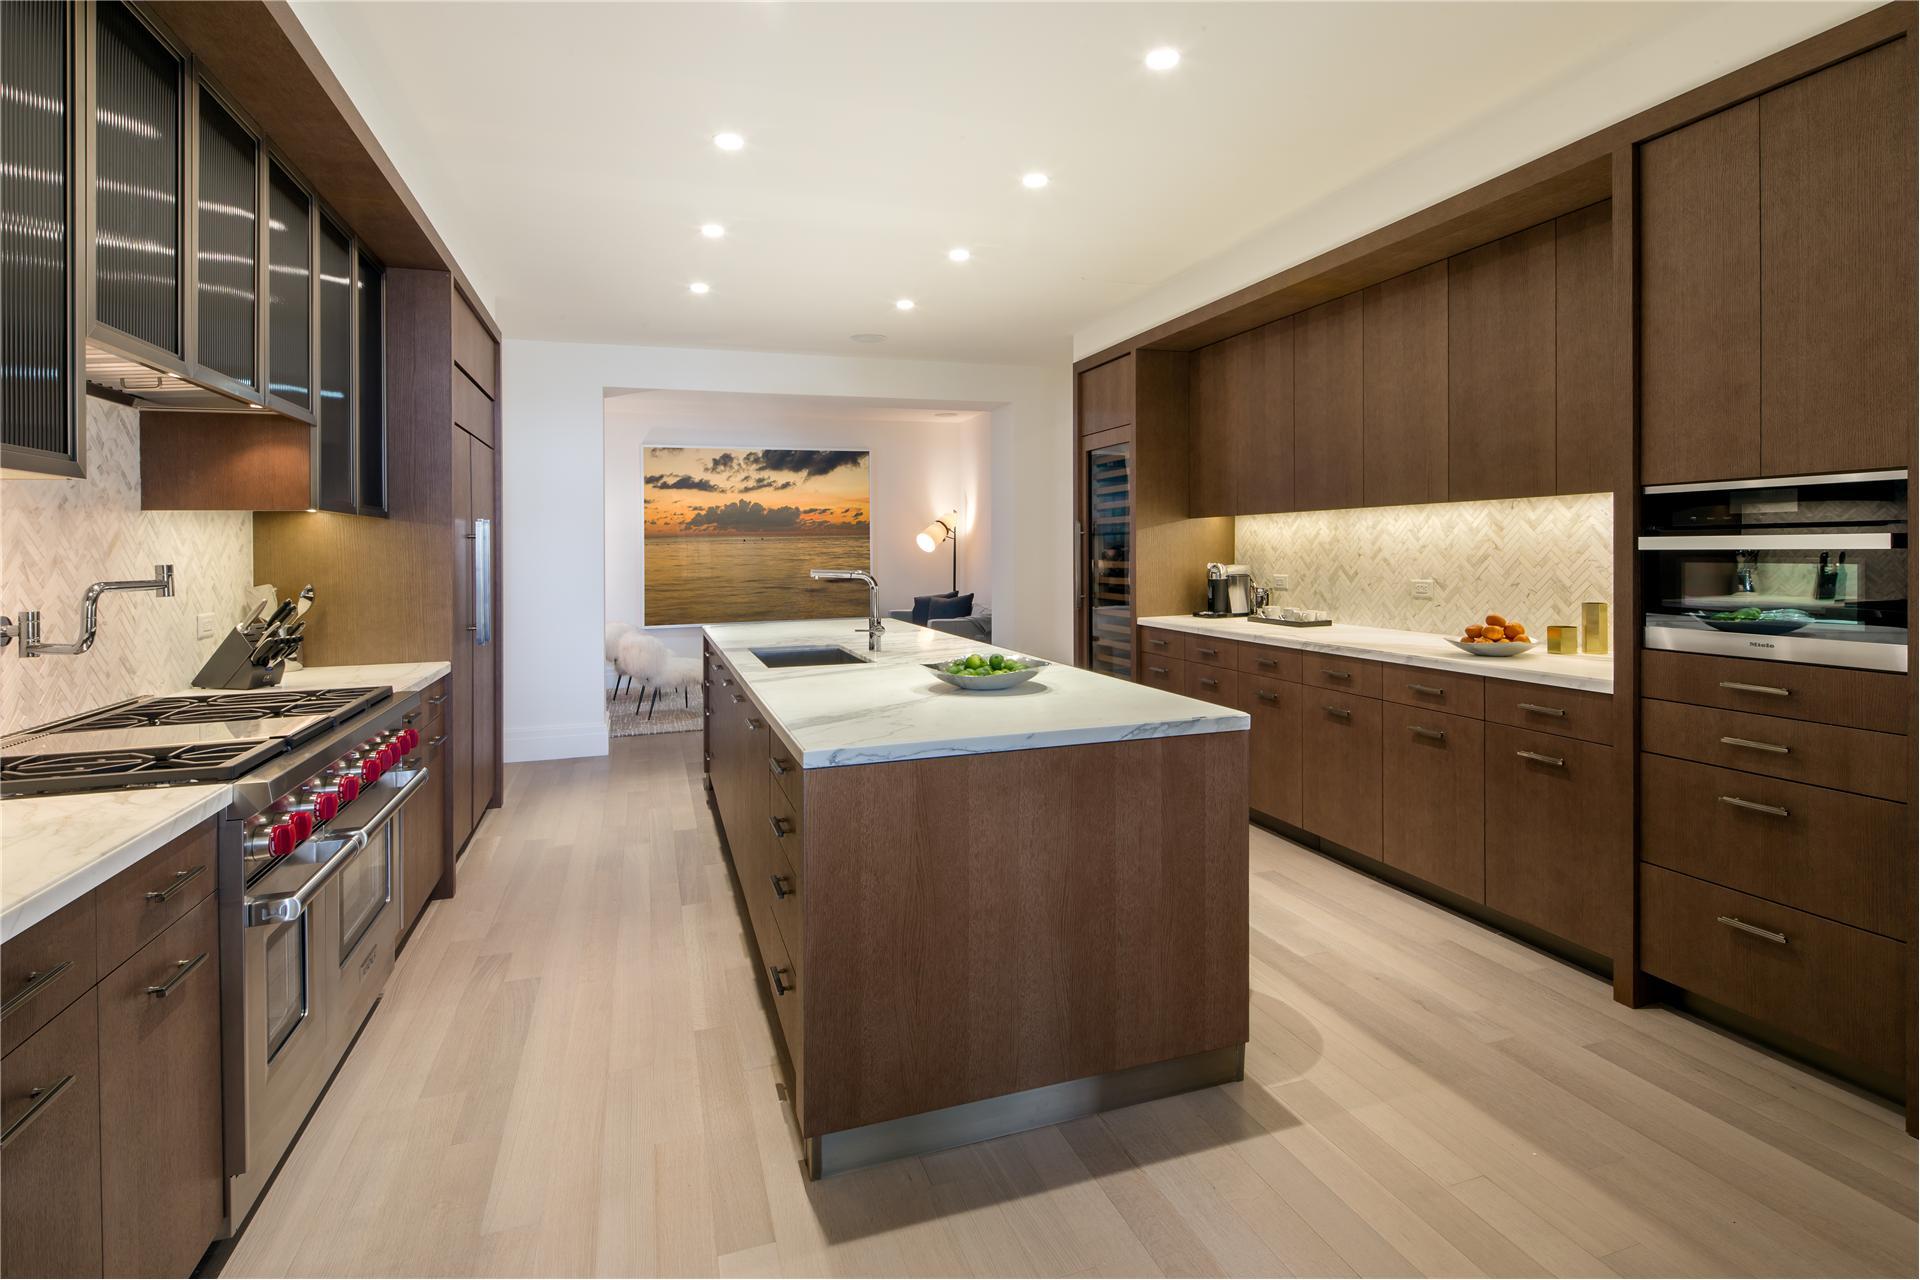 Condominium for Sale at Ralph Walker Tribeca, Ralph Walker Tribeca, 100 Barclay Street New York, New York 10007 United States